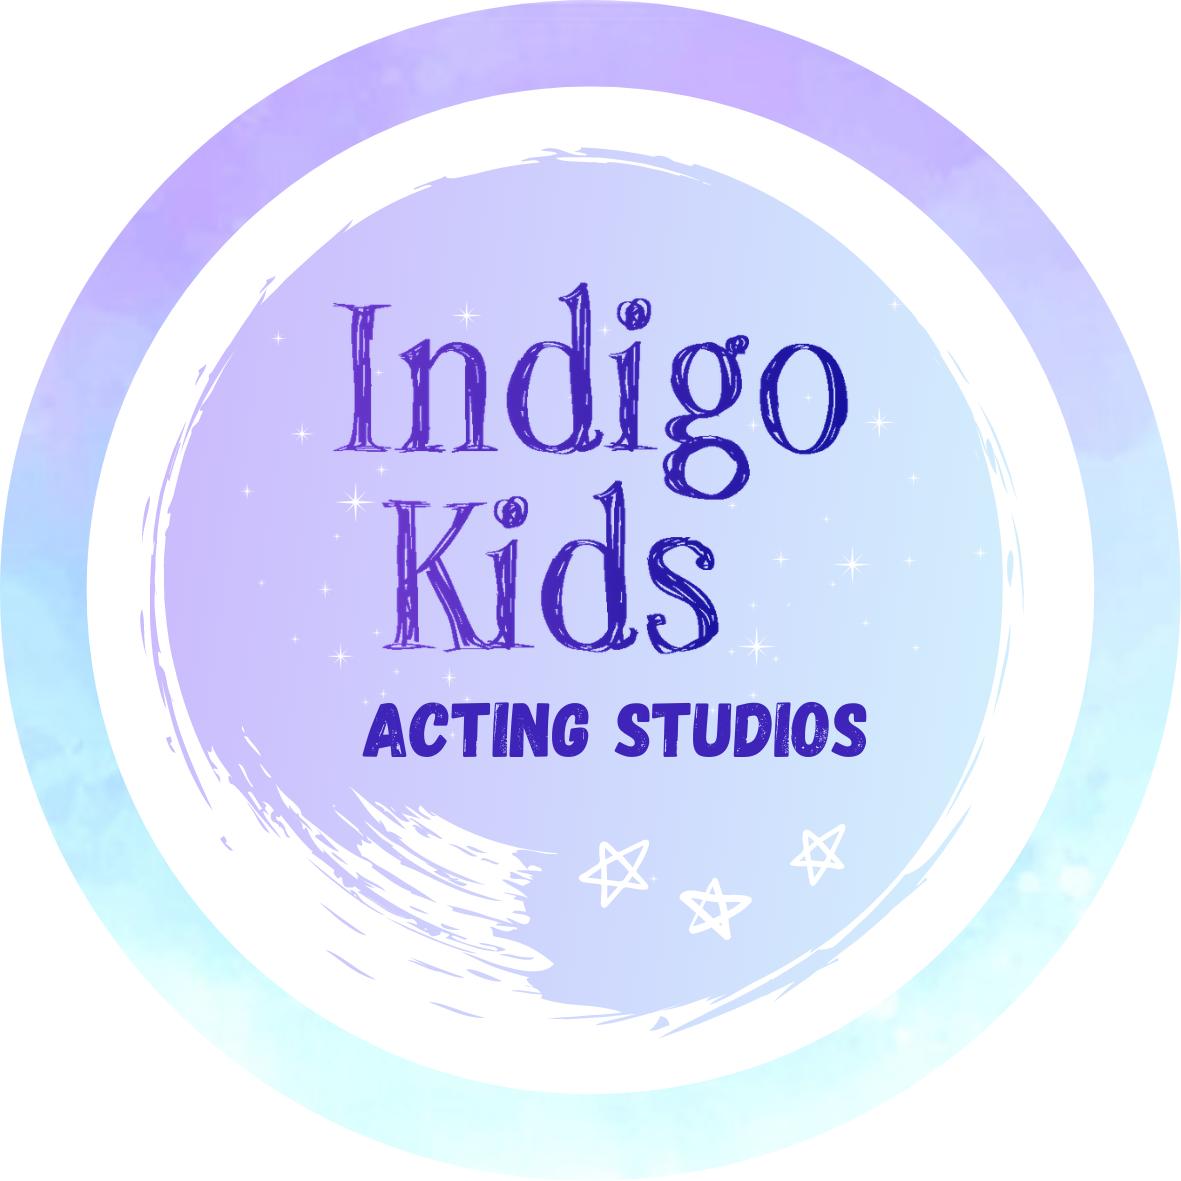 Indigo Kids Acting Studios